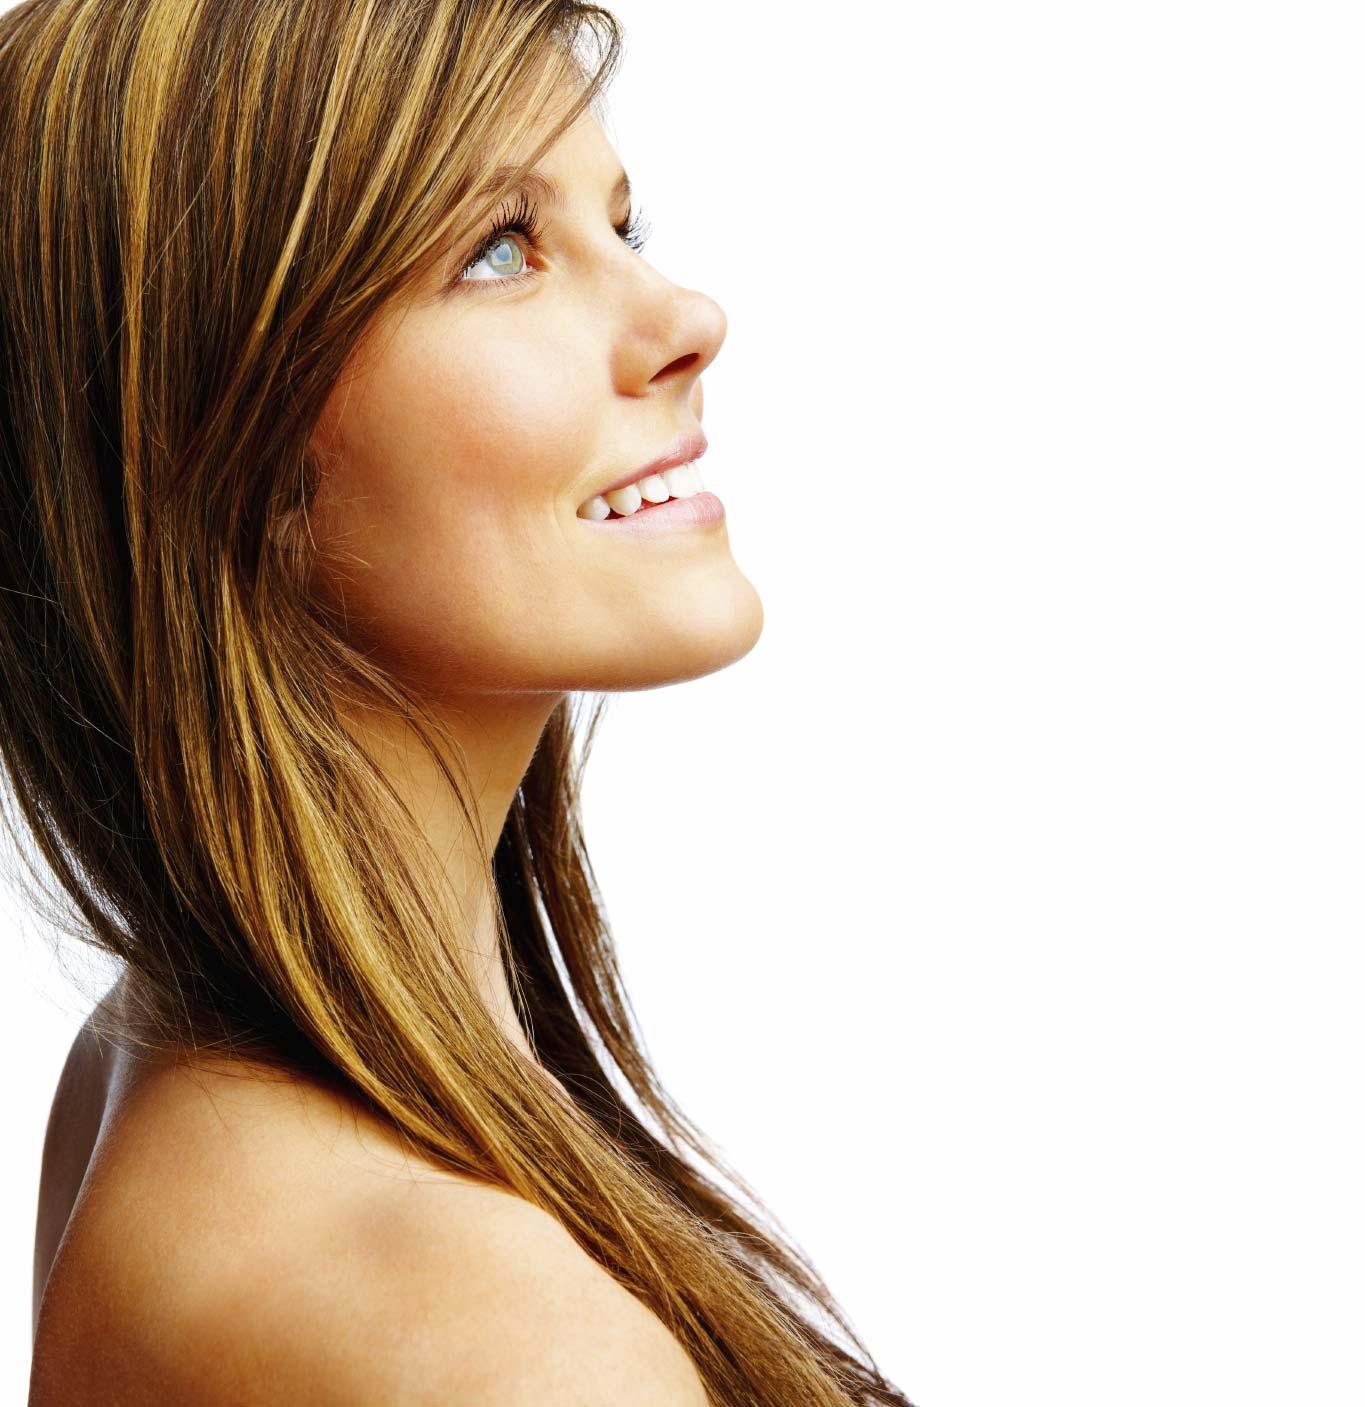 Hair Loss Products Hair Loss Treatments Women And Men